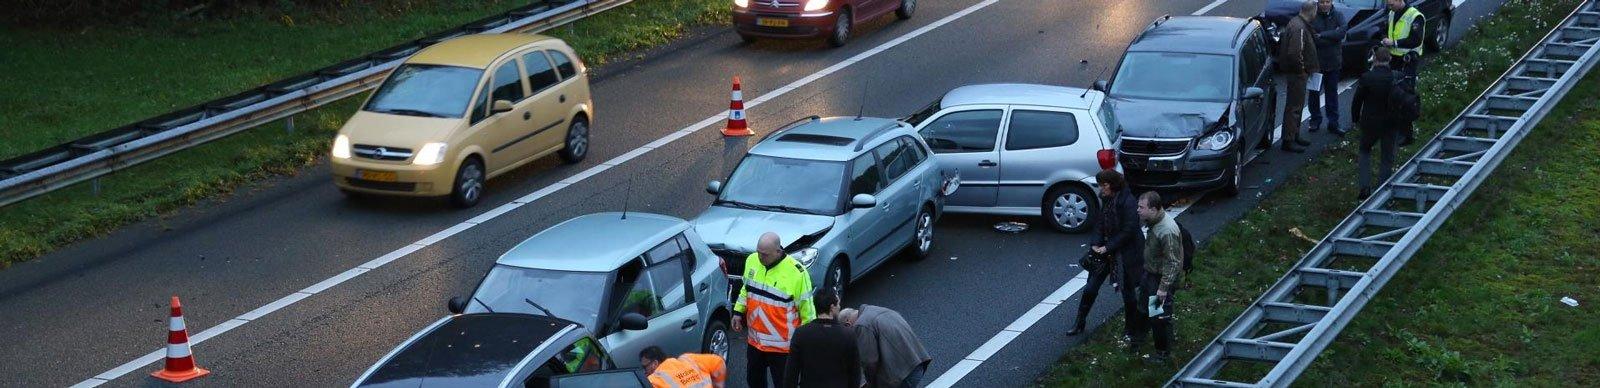 Kettingbotsing op snelweg | LetselPro